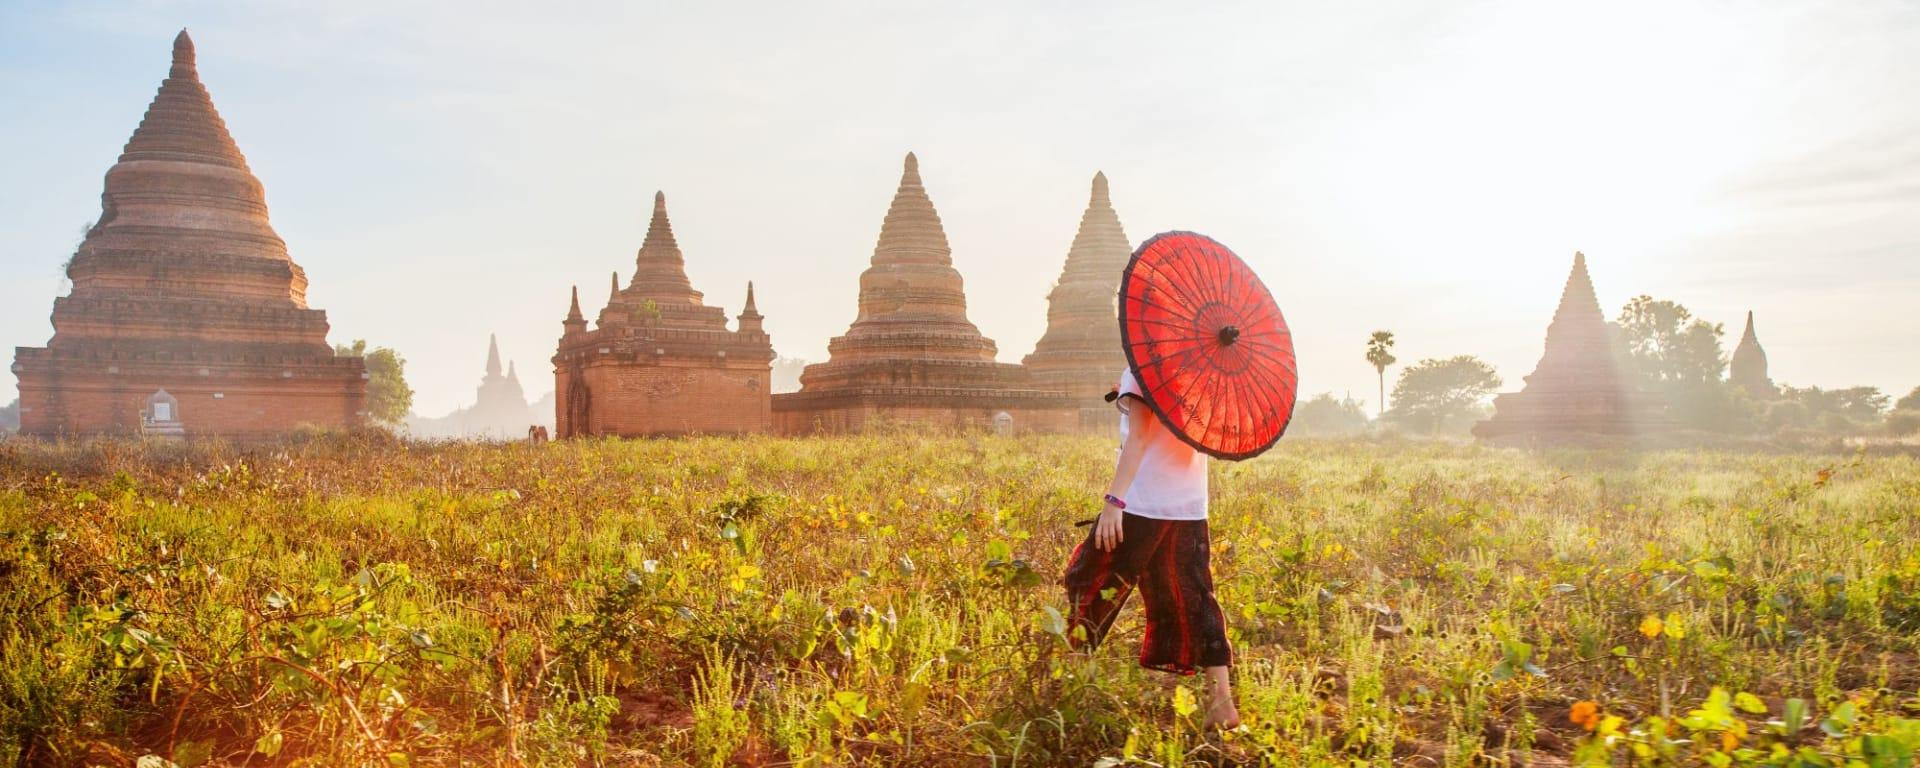 La fascination du Myanmar – un pays en mutation de Yangon: Bagan Young girl with traditional burmese parasol